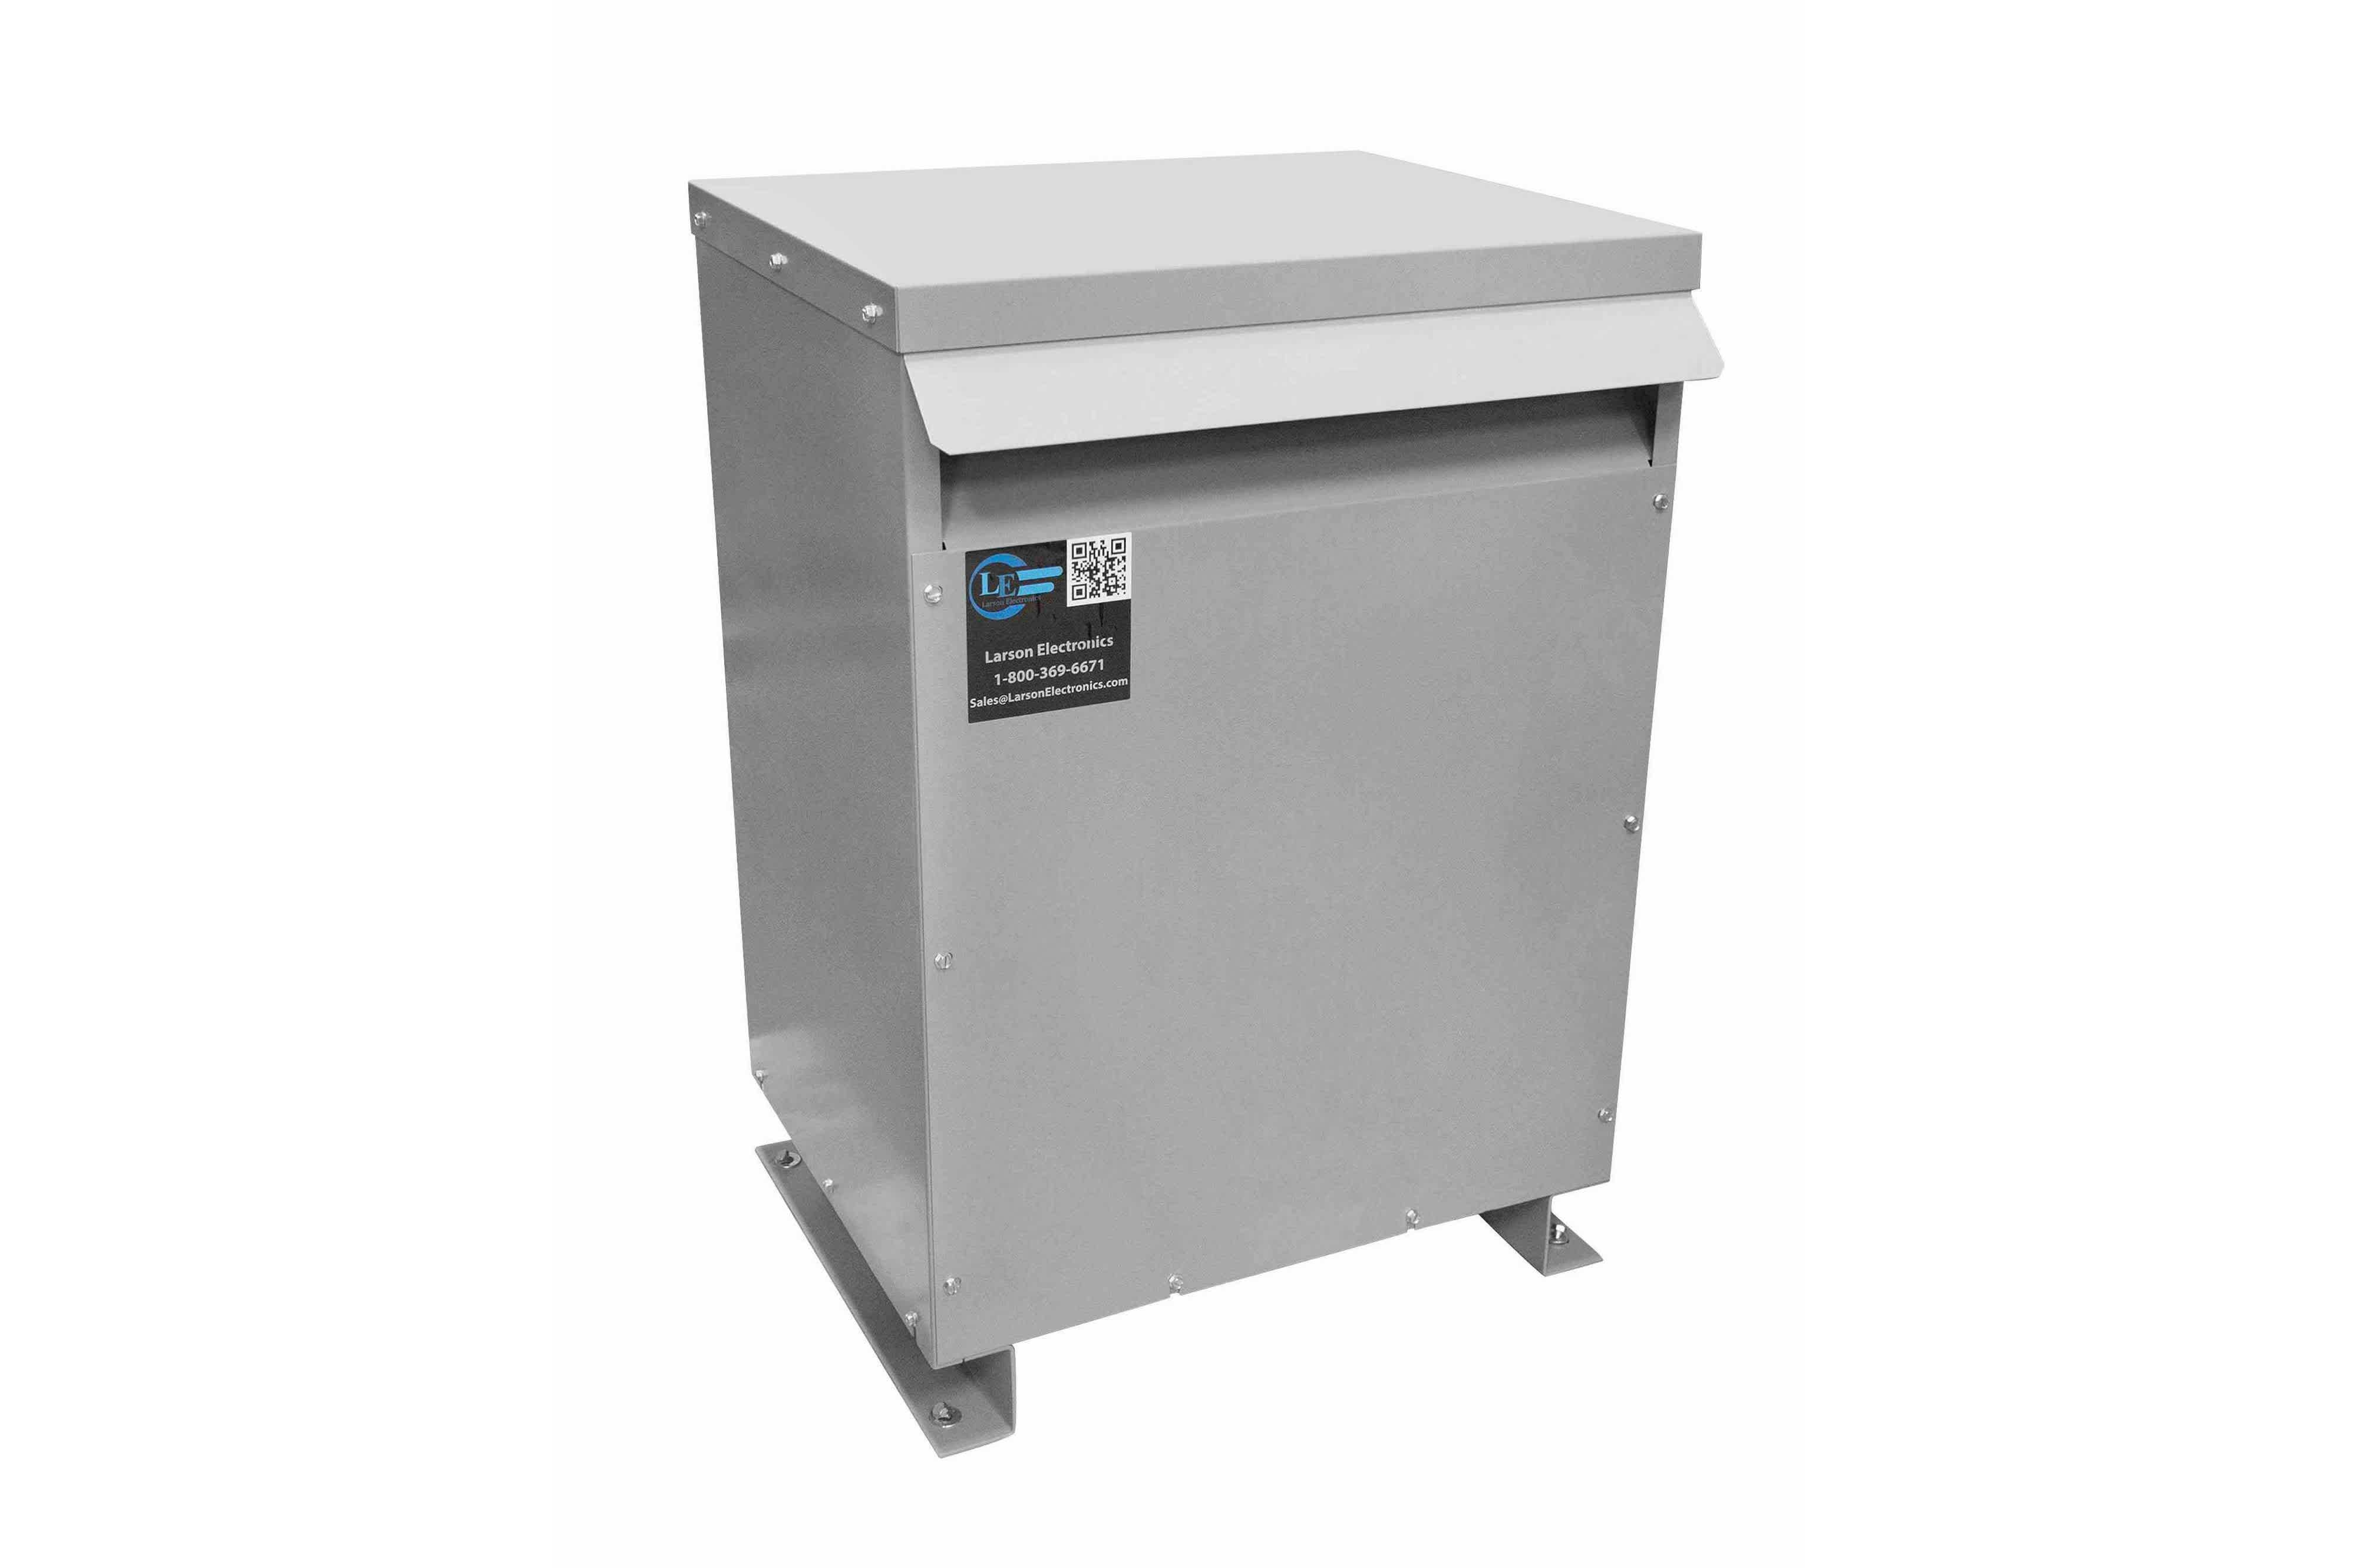 150 kVA 3PH Isolation Transformer, 600V Wye Primary, 380Y/220 Wye-N Secondary, N3R, Ventilated, 60 Hz